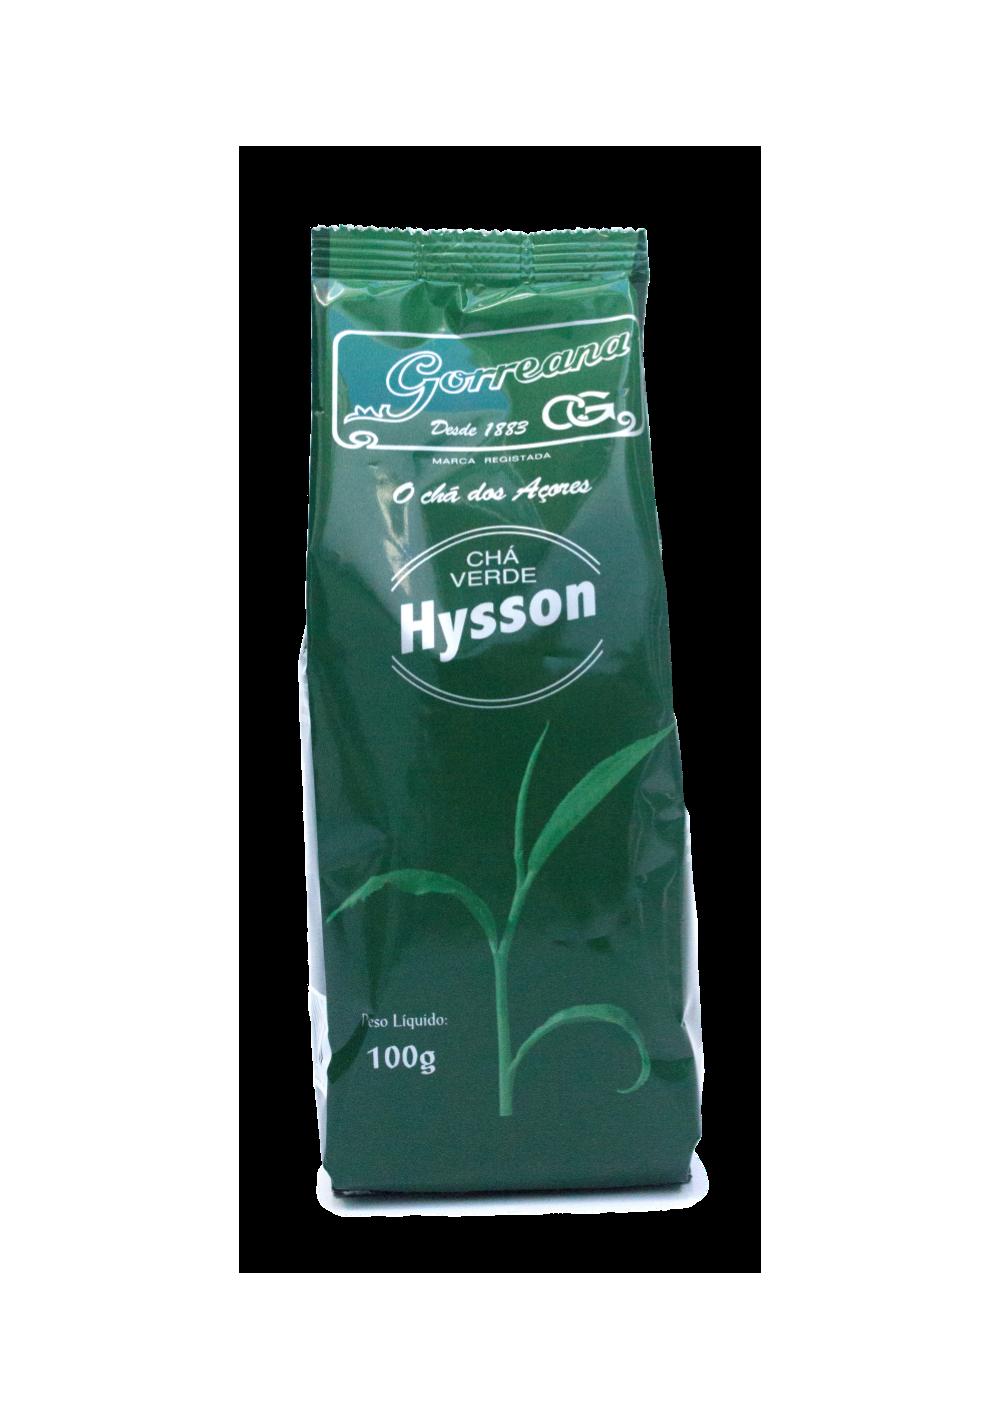 Hysson Green Tea (loose leaf)